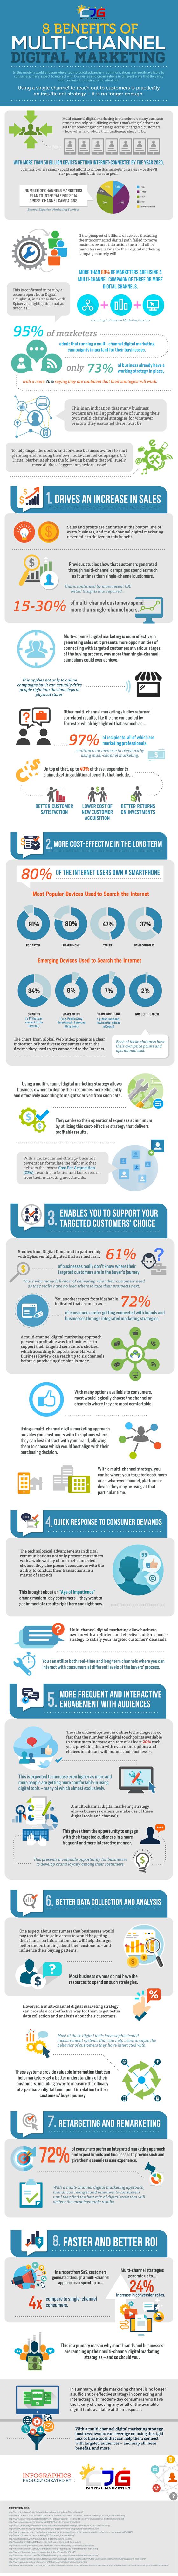 8-Benefits-of-Multi-Channel-Digital-Marketing